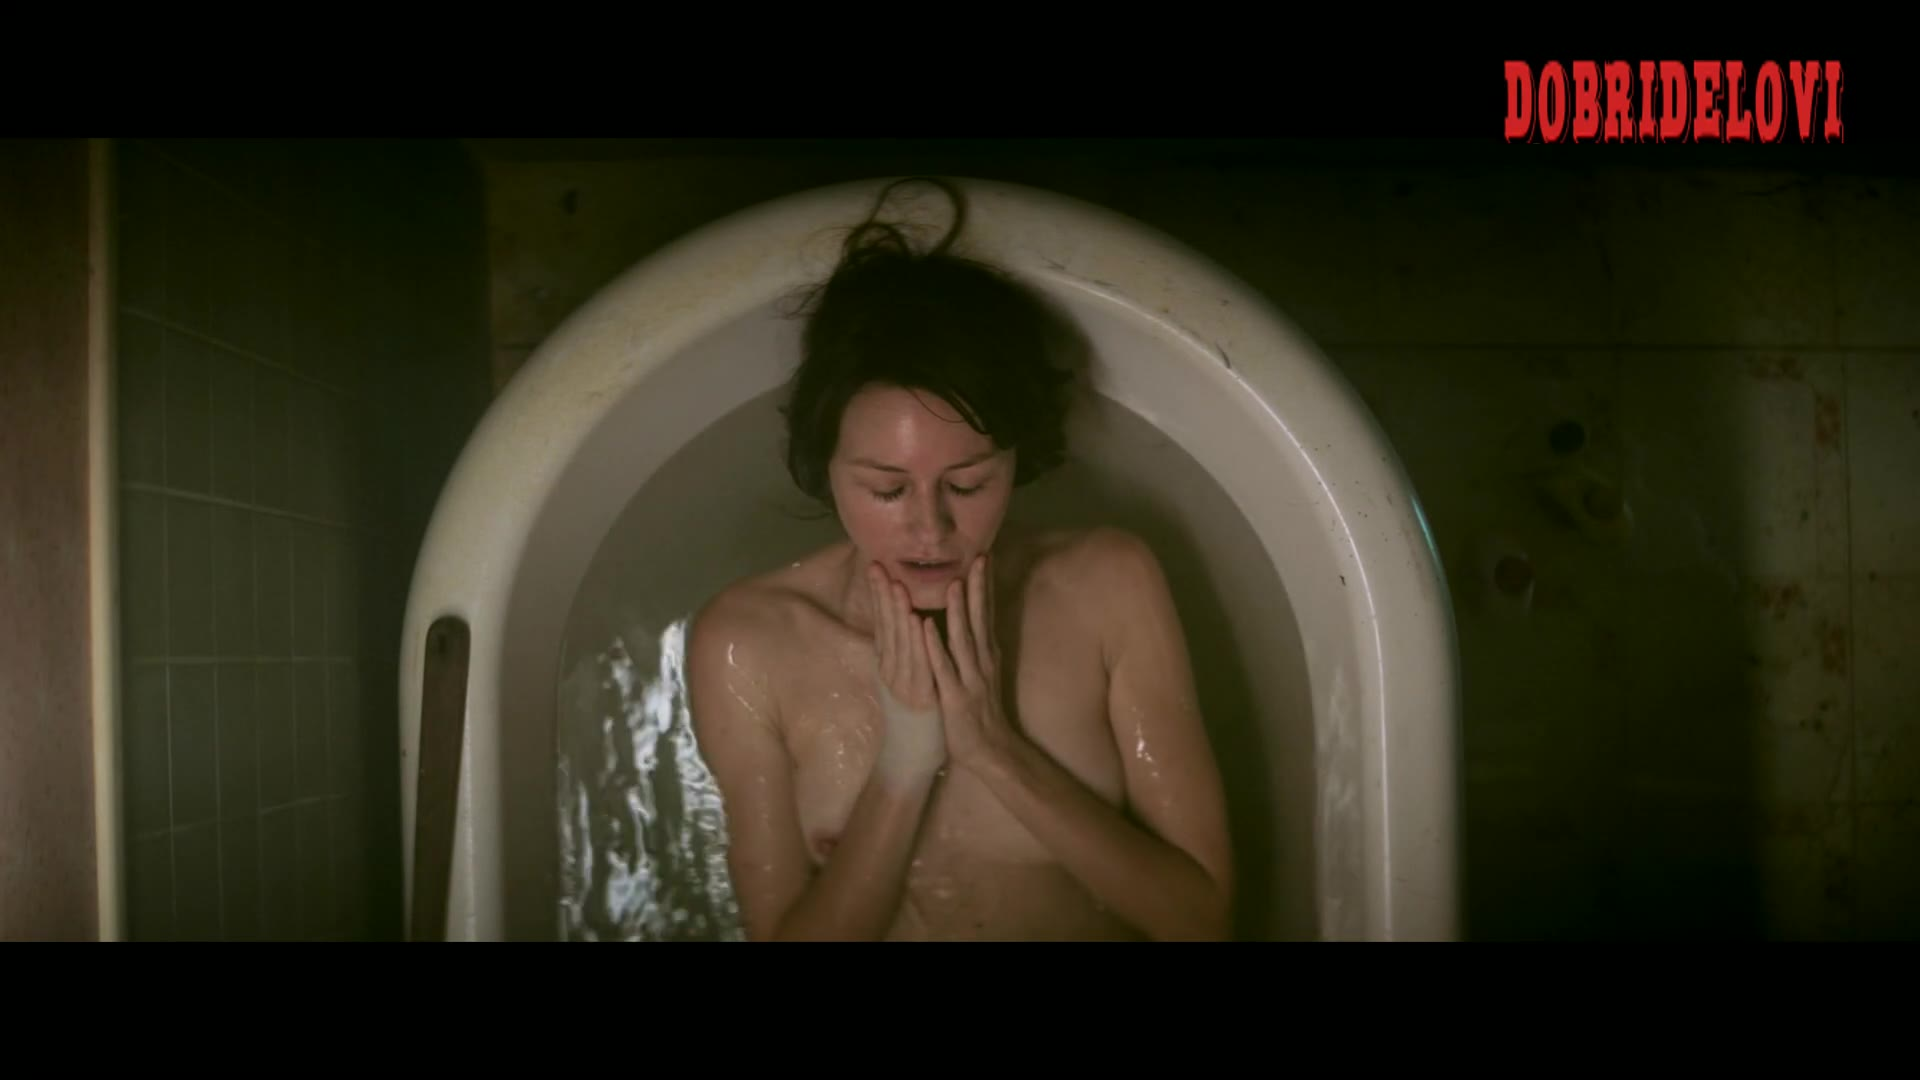 Naomi Watts bathub scene from The Wolf Hour